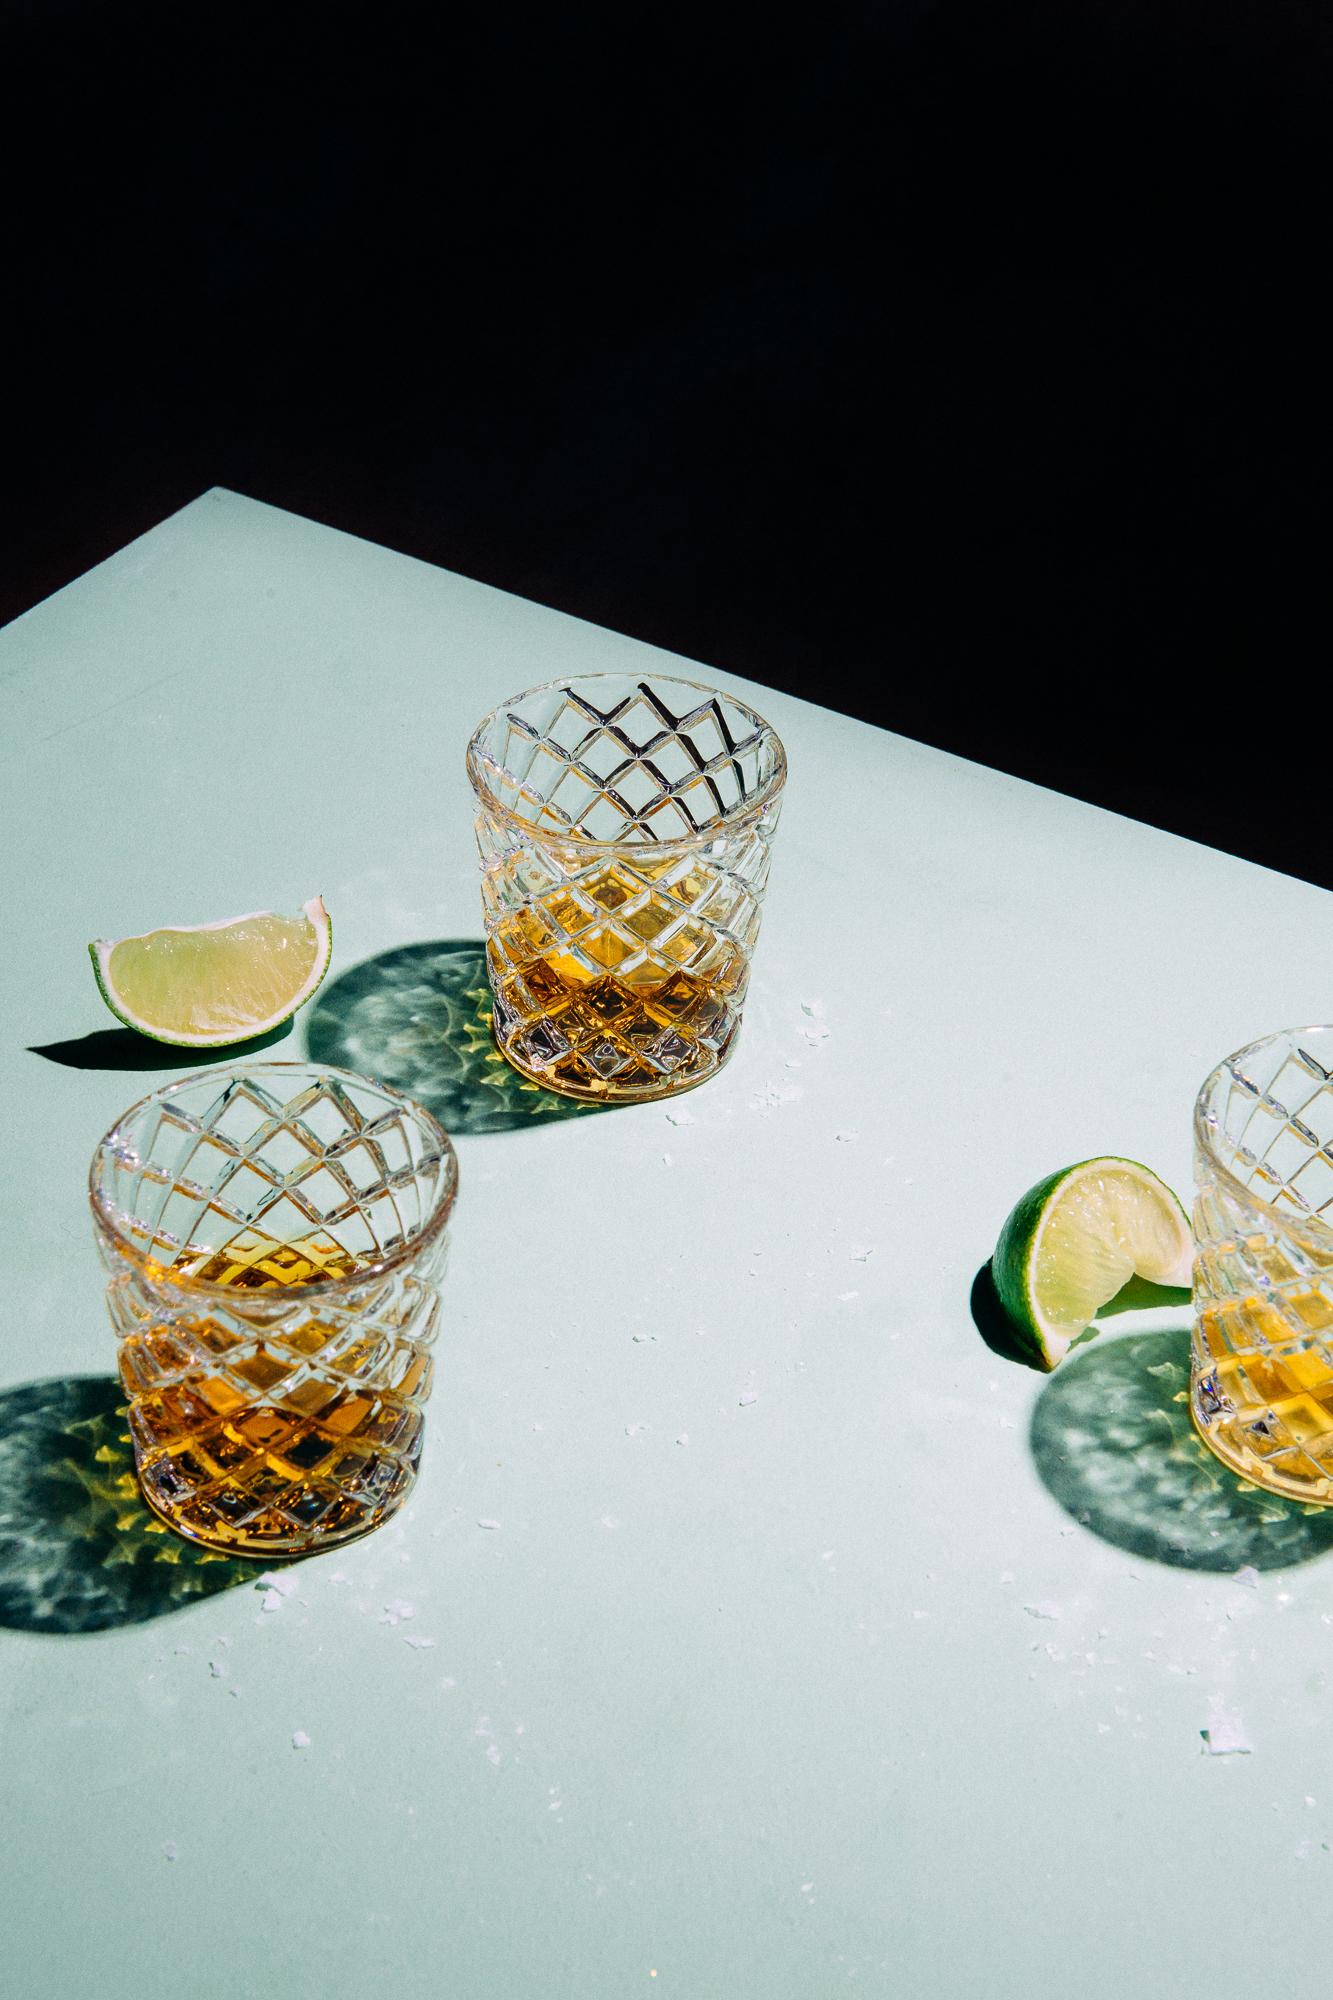 Tequila Shots | Lauren V. Allen | Food & Travel Photographer | Raleigh-Durham, N.C.